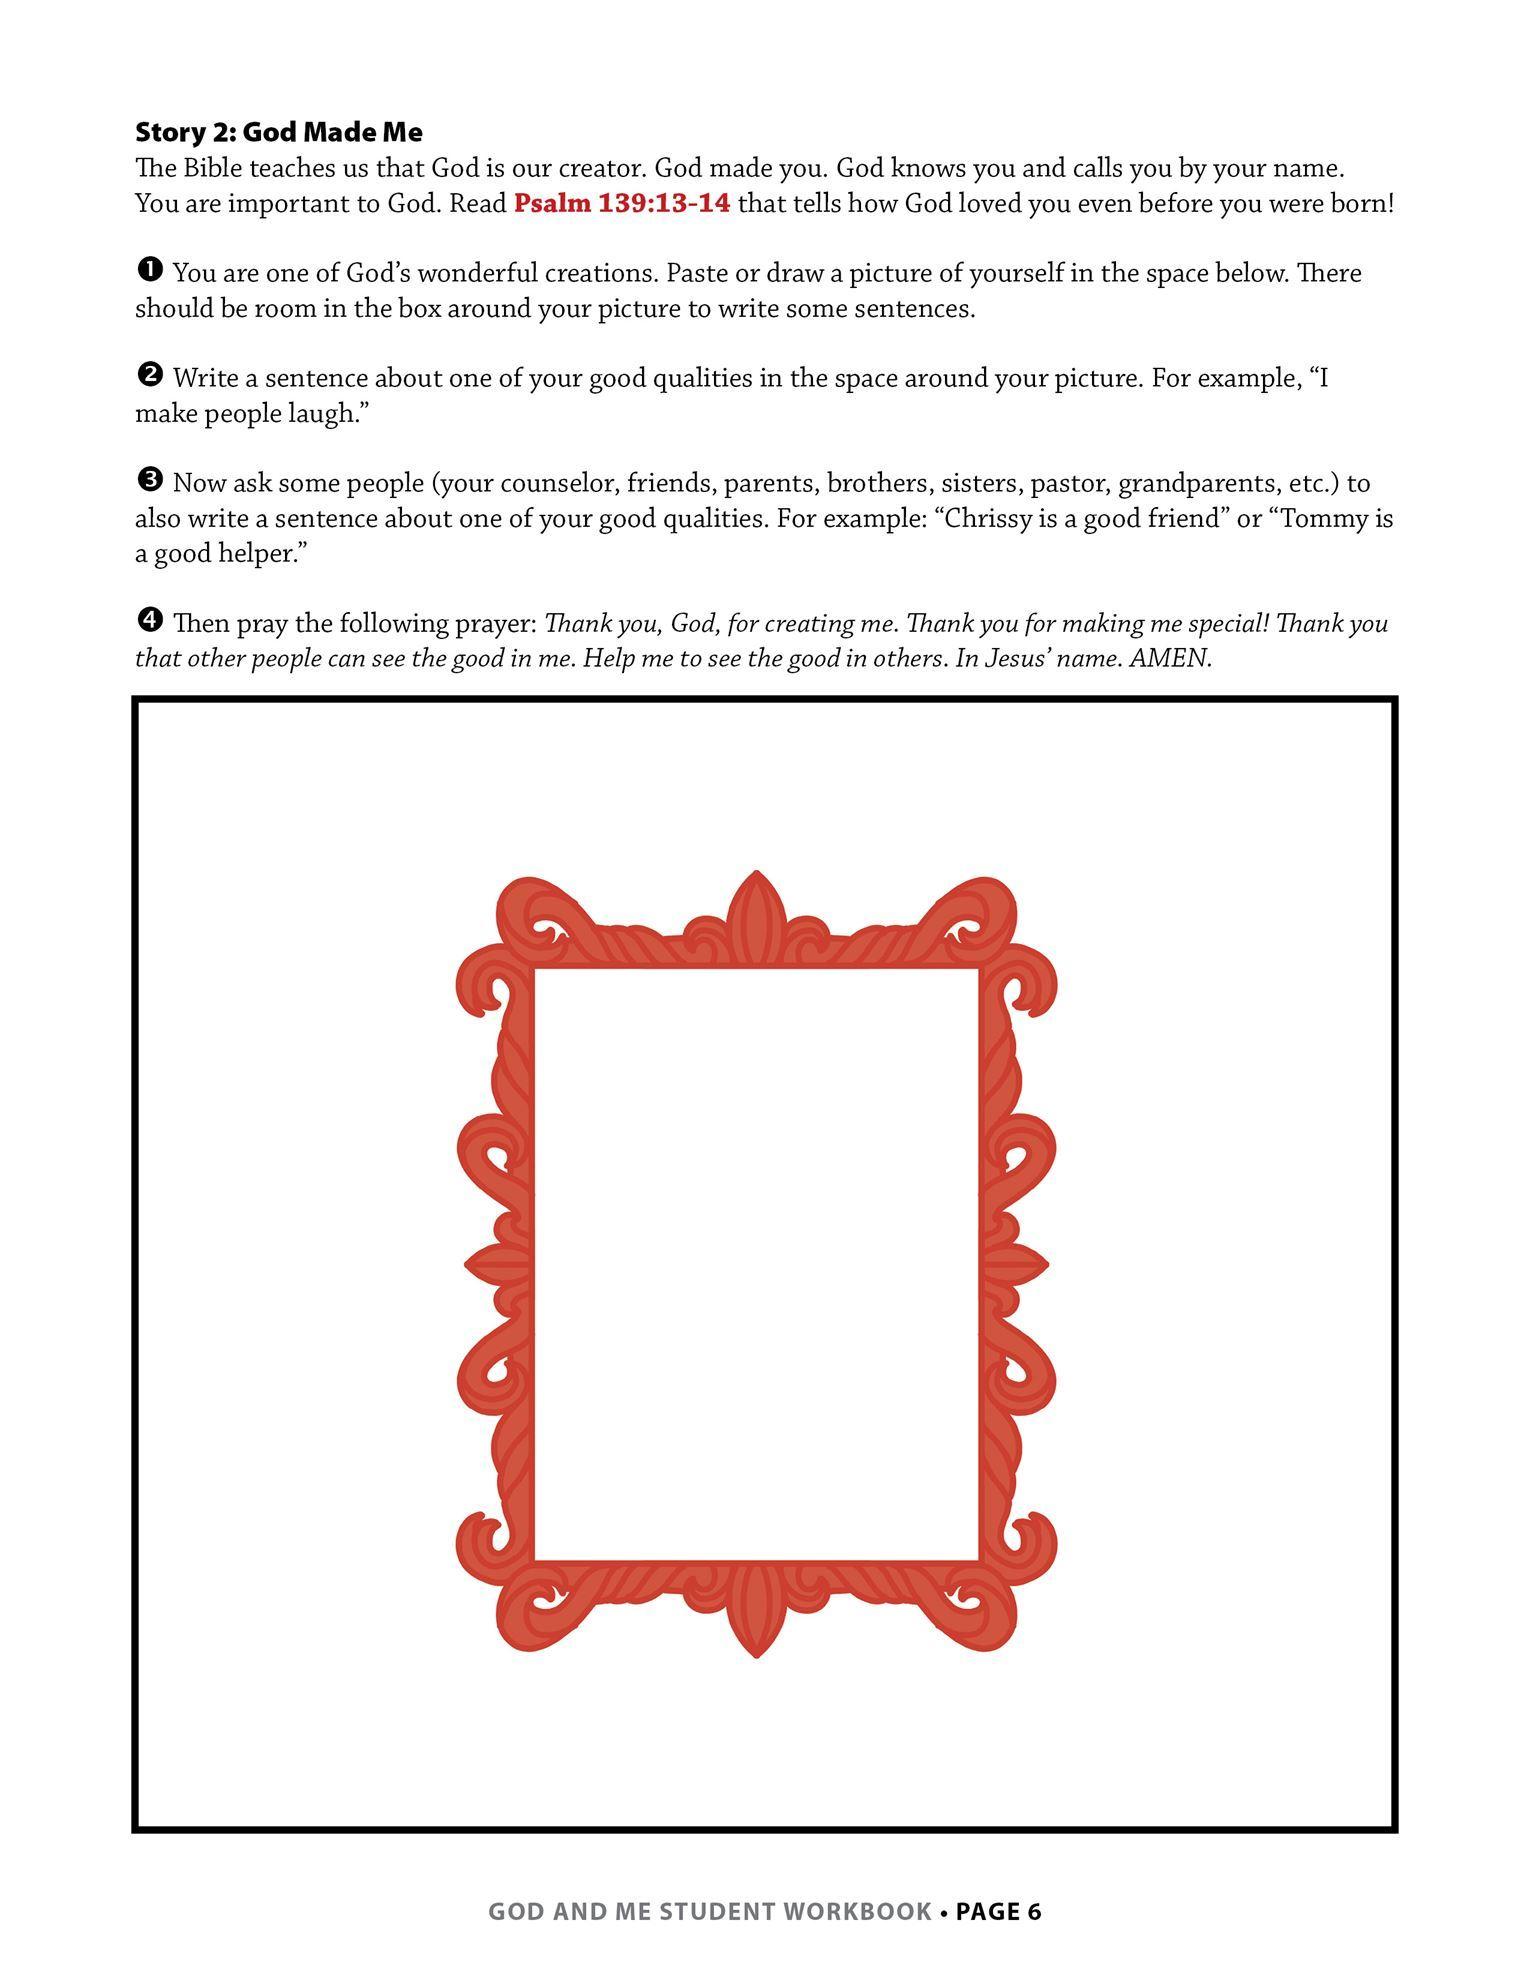 Lesson 1, page 6